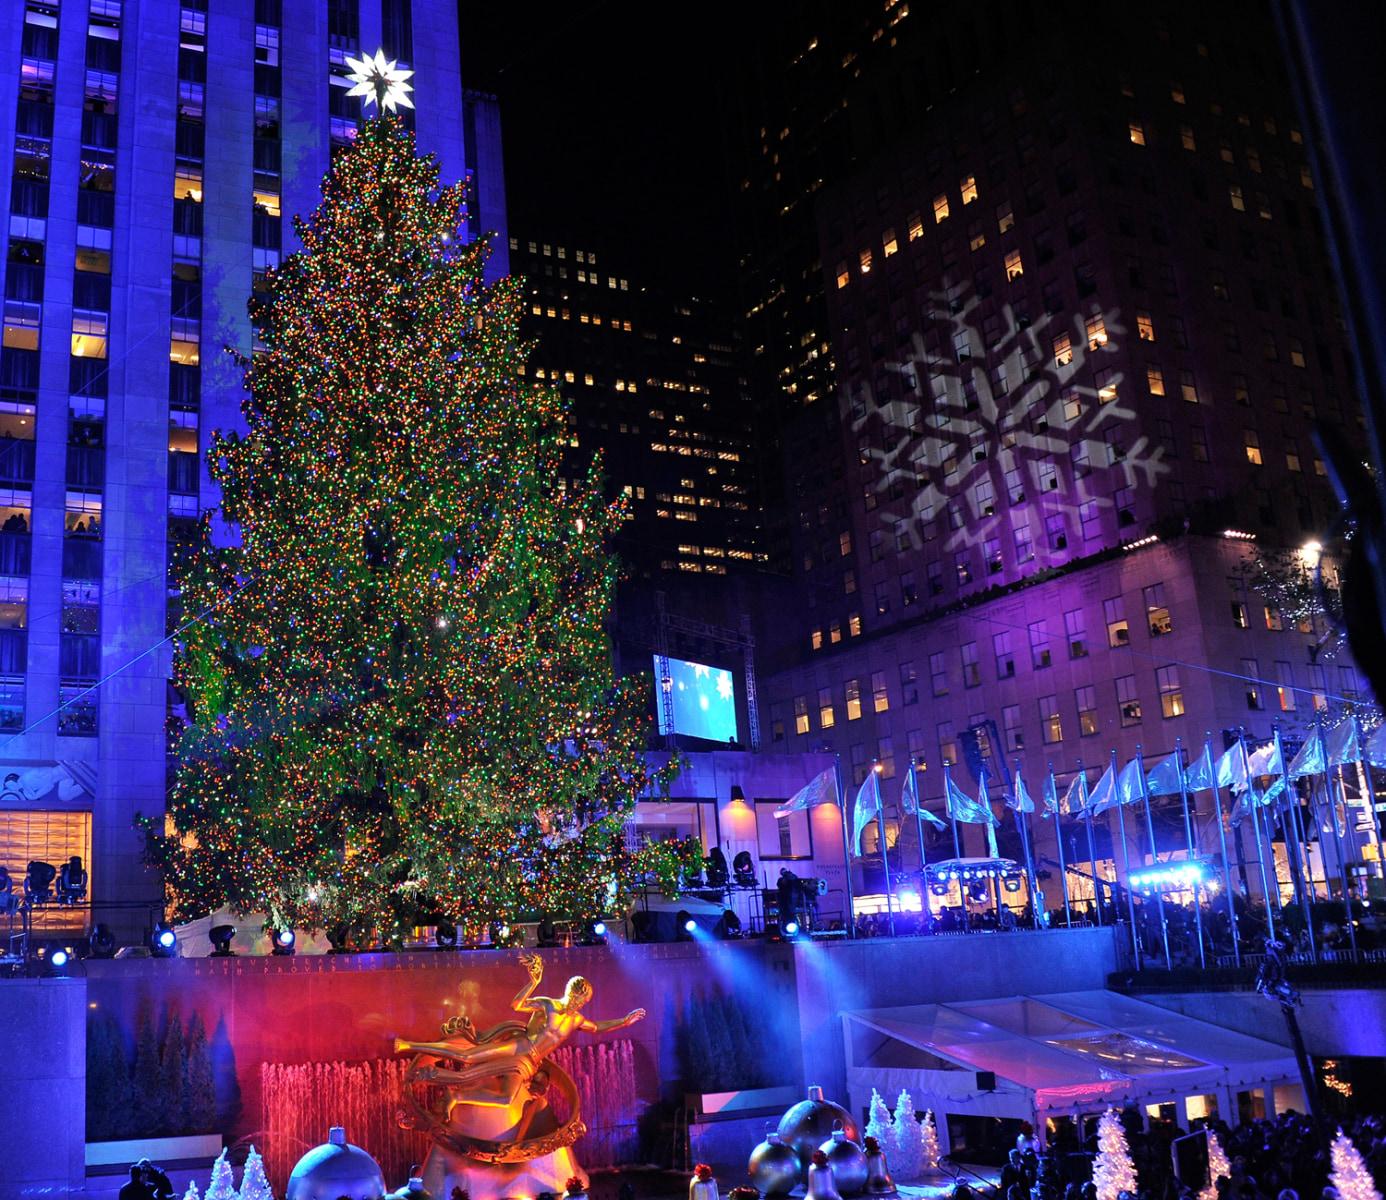 Rockefeller Center Christmas Tree Lighting Performers: Holiday Season Lights Up